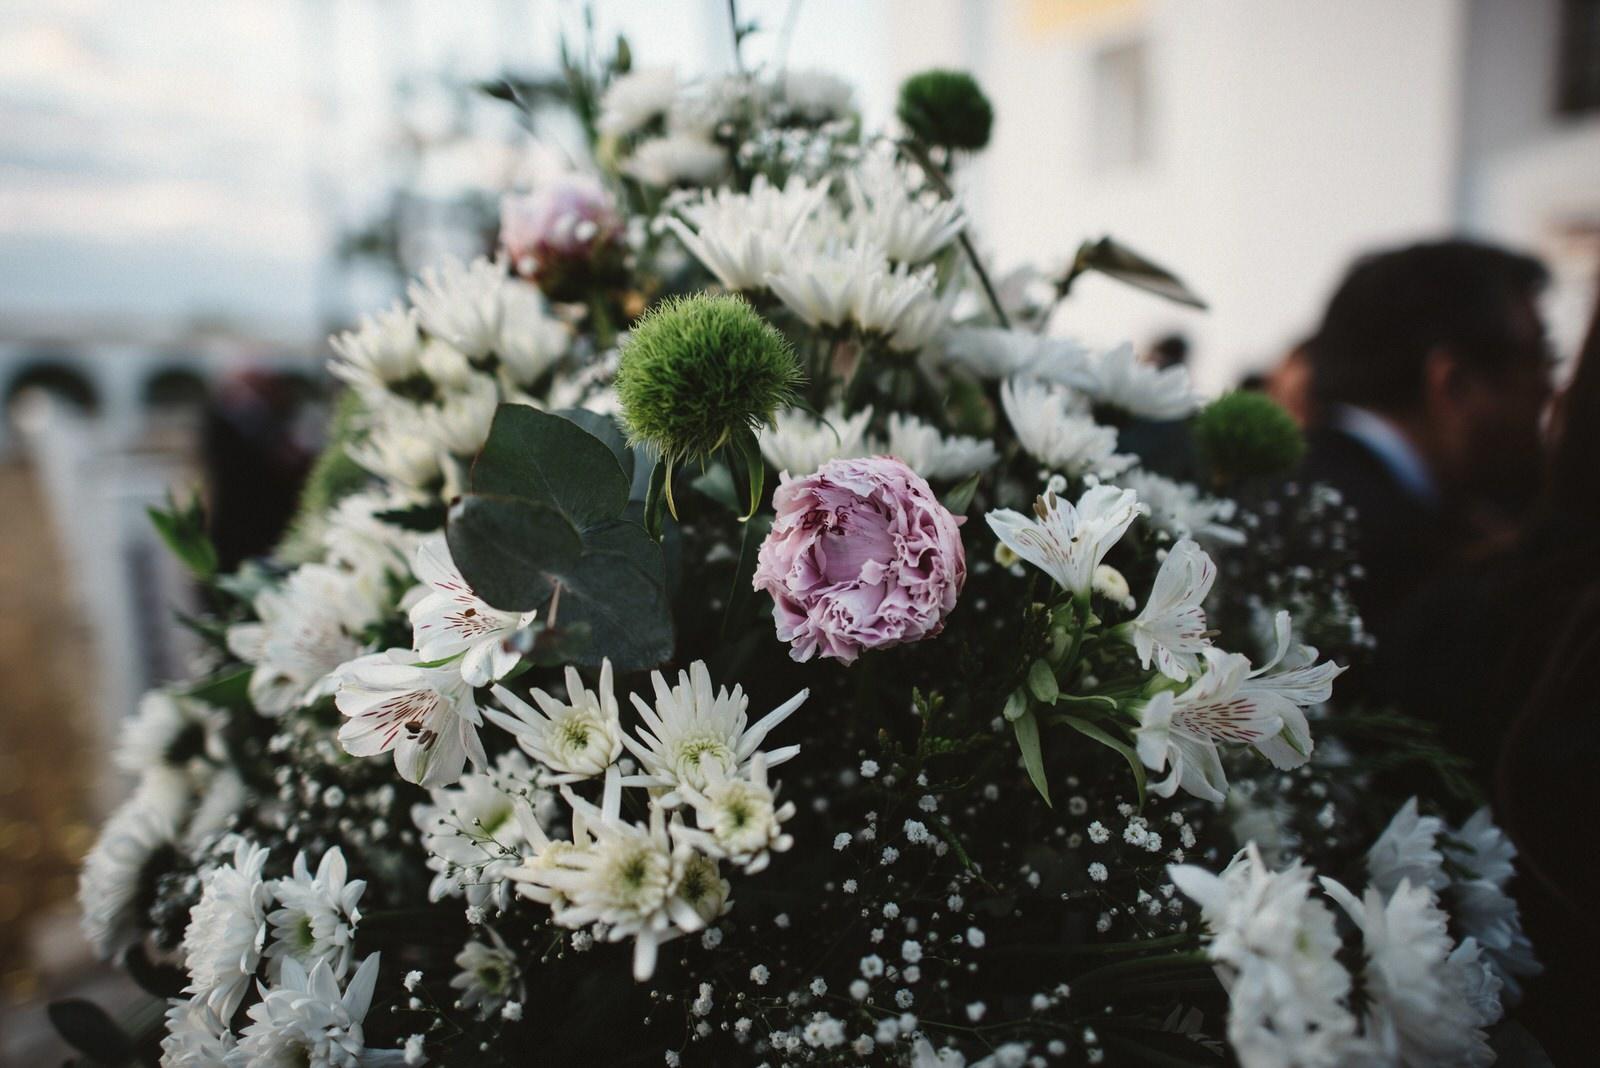 fotografo de bodas sevilla - fotografo boda - fotografía sevilla - Andrés AmarilloAAA_3216- fine.JPG